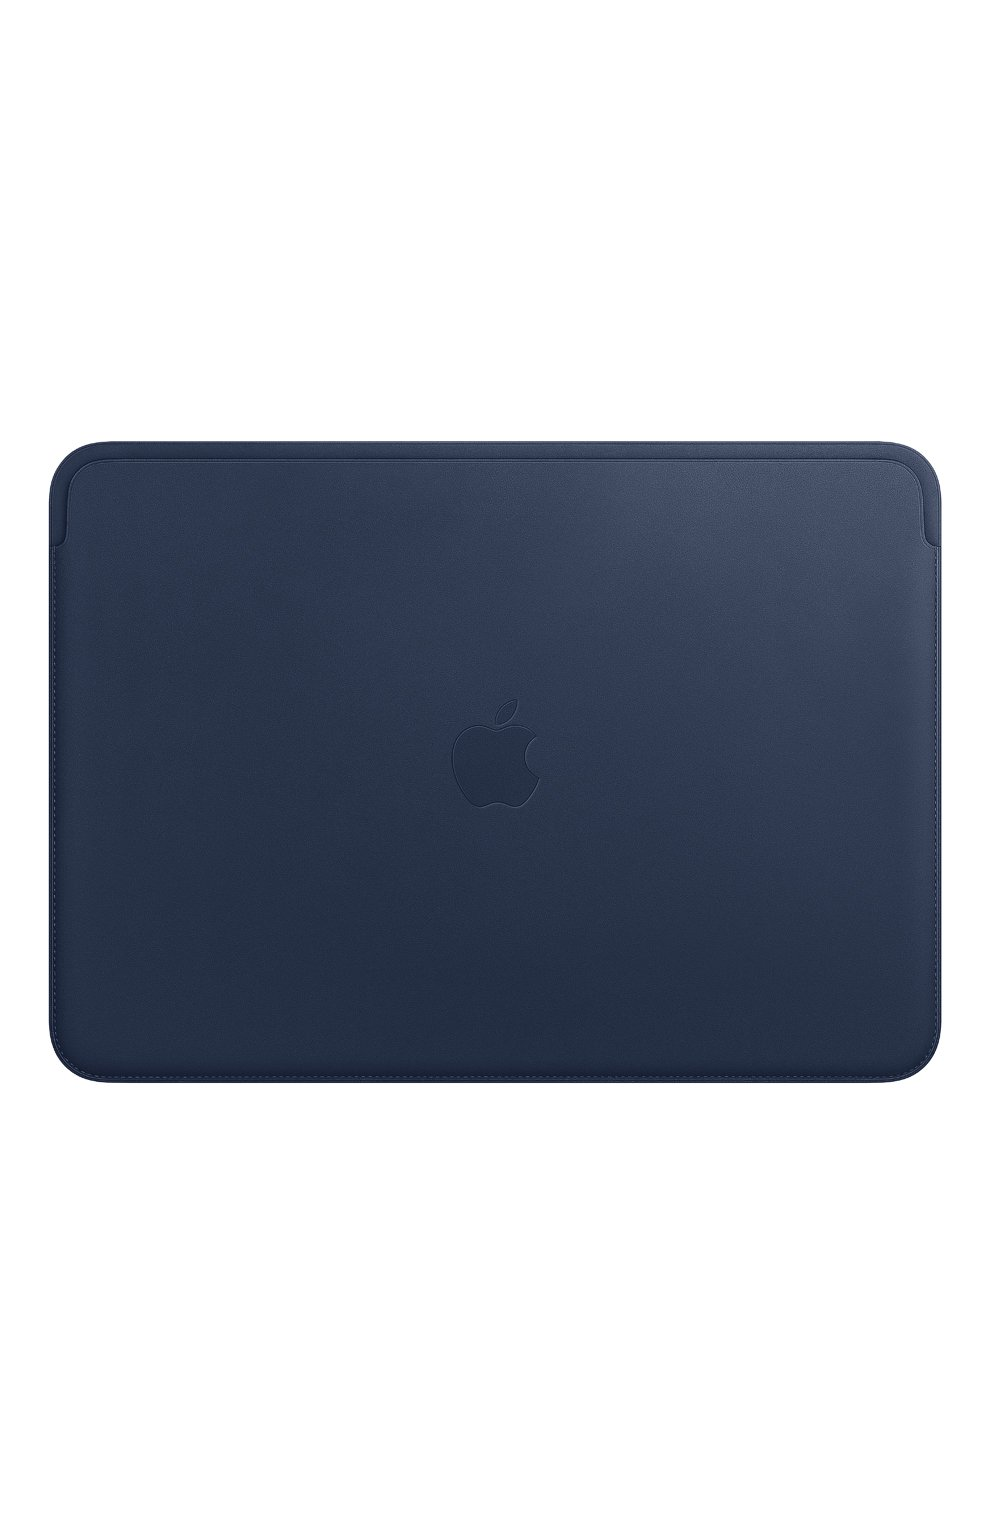 "Чехол leather sleeve для macbook 13"" APPLE  темно-синего цвета, арт. MRQL2ZM/A | Фото 1"